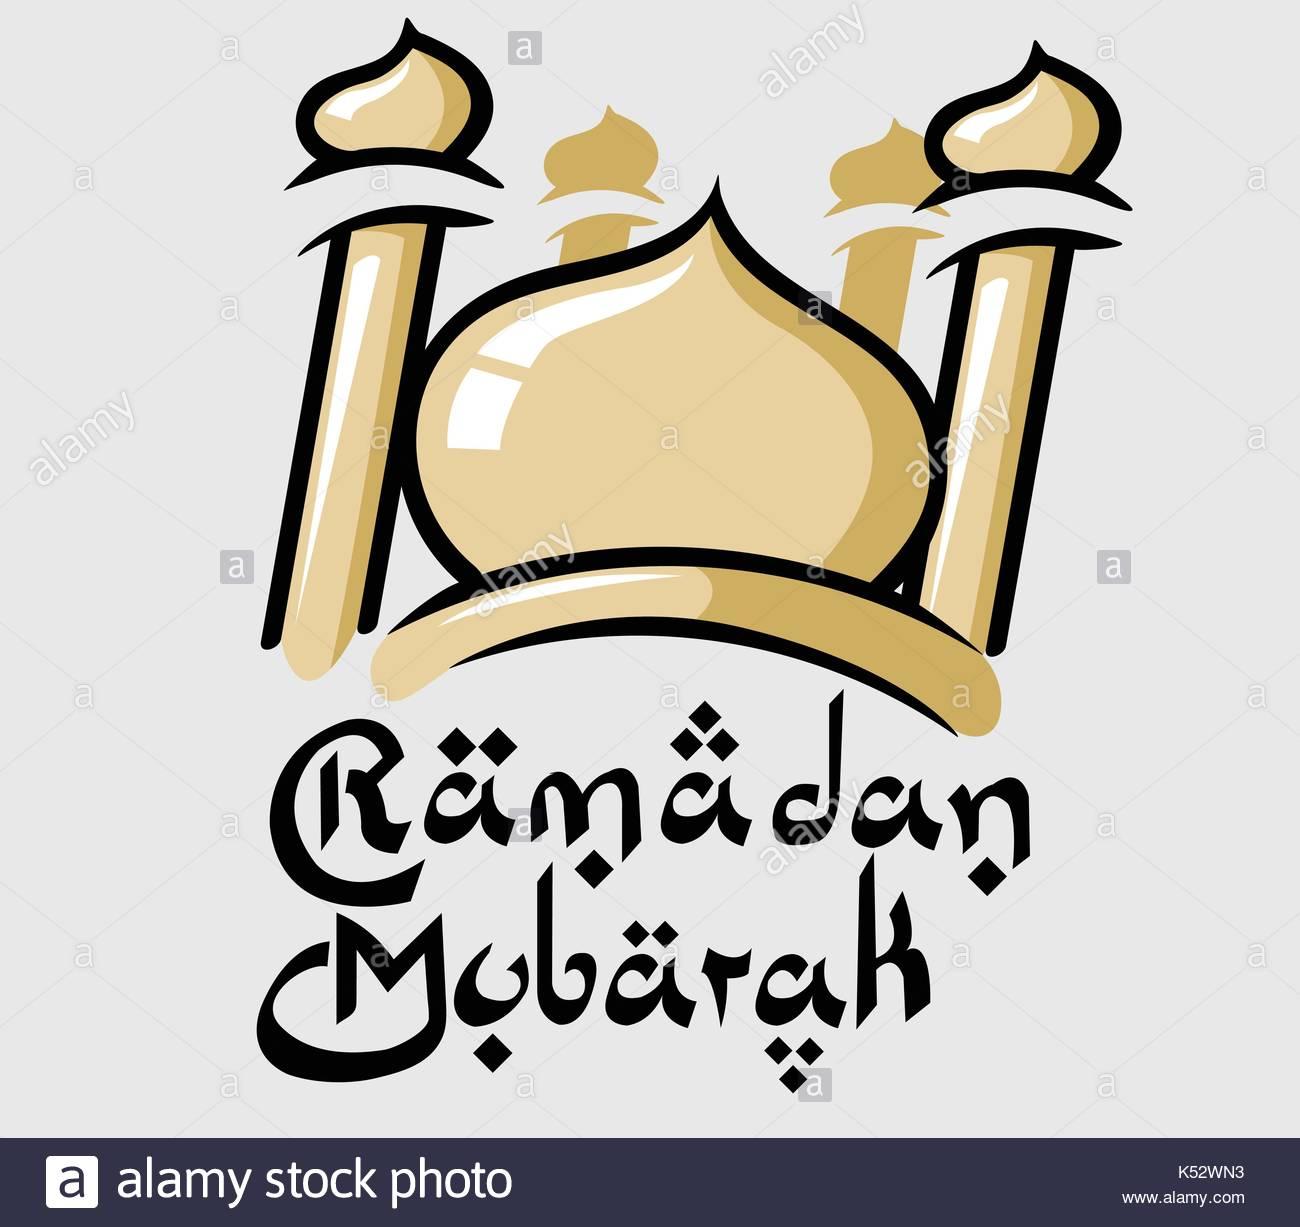 Ramadan greeting stock photos ramadan greeting stock images alamy vector illustration of ramadan greeting stock image kristyandbryce Image collections